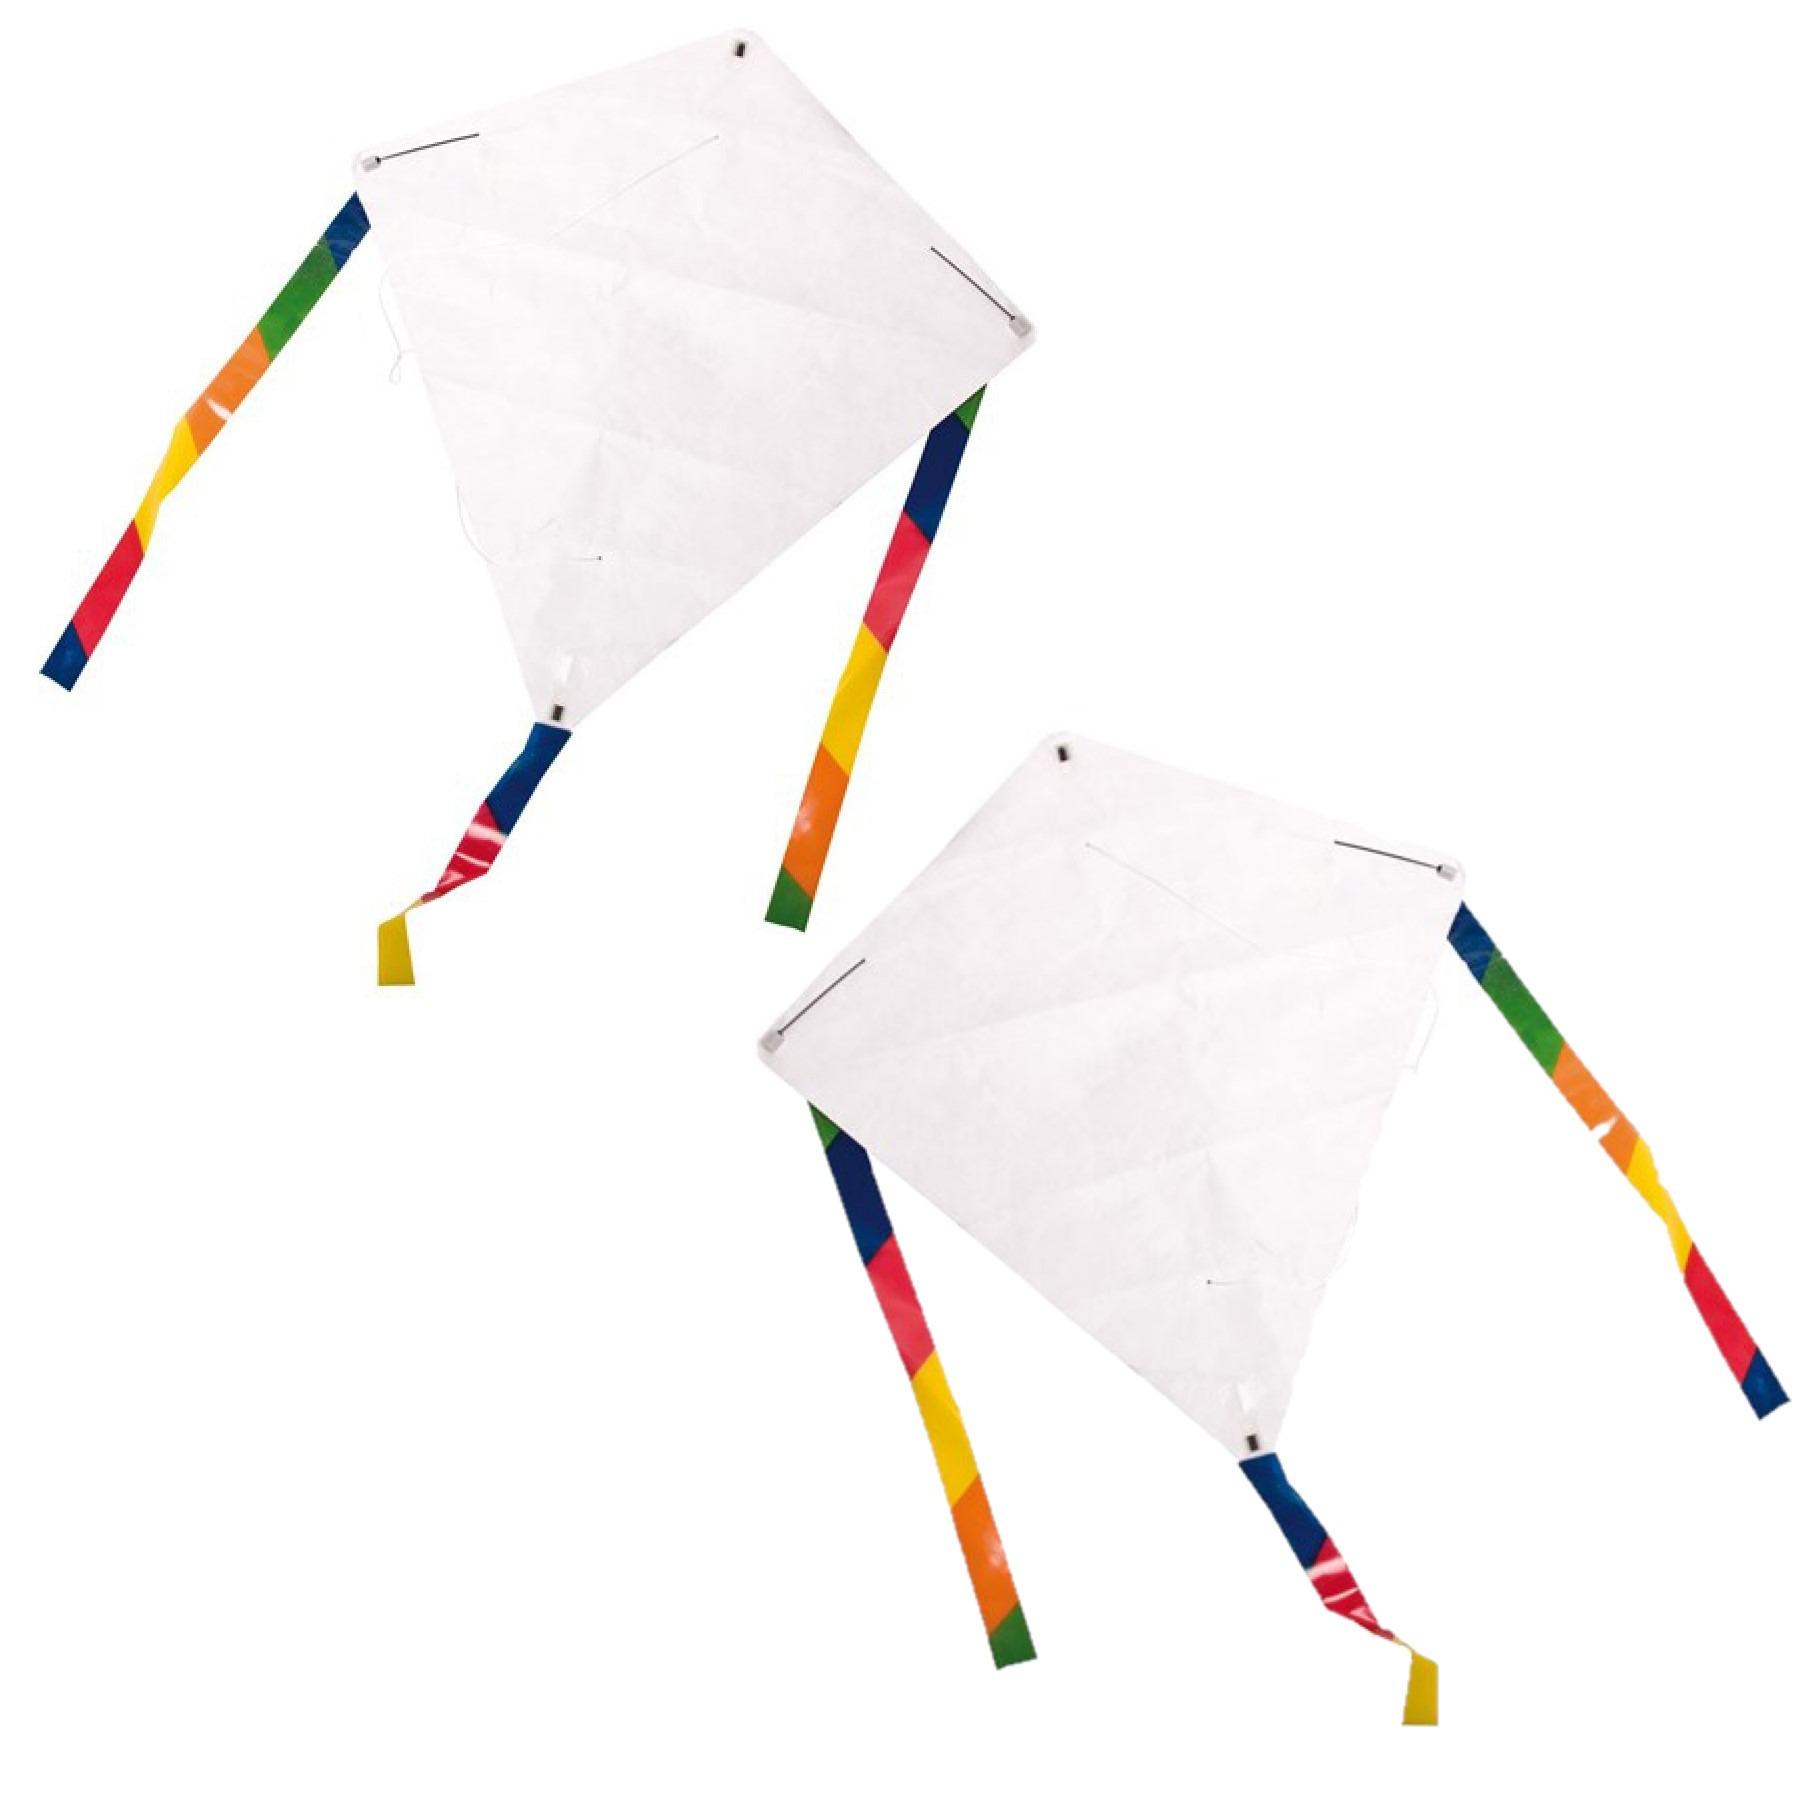 Set van 8x stuks blanco vliegers DIY knutselpakket inclusief 6 krijtjes per pakket 49 x 49 cm